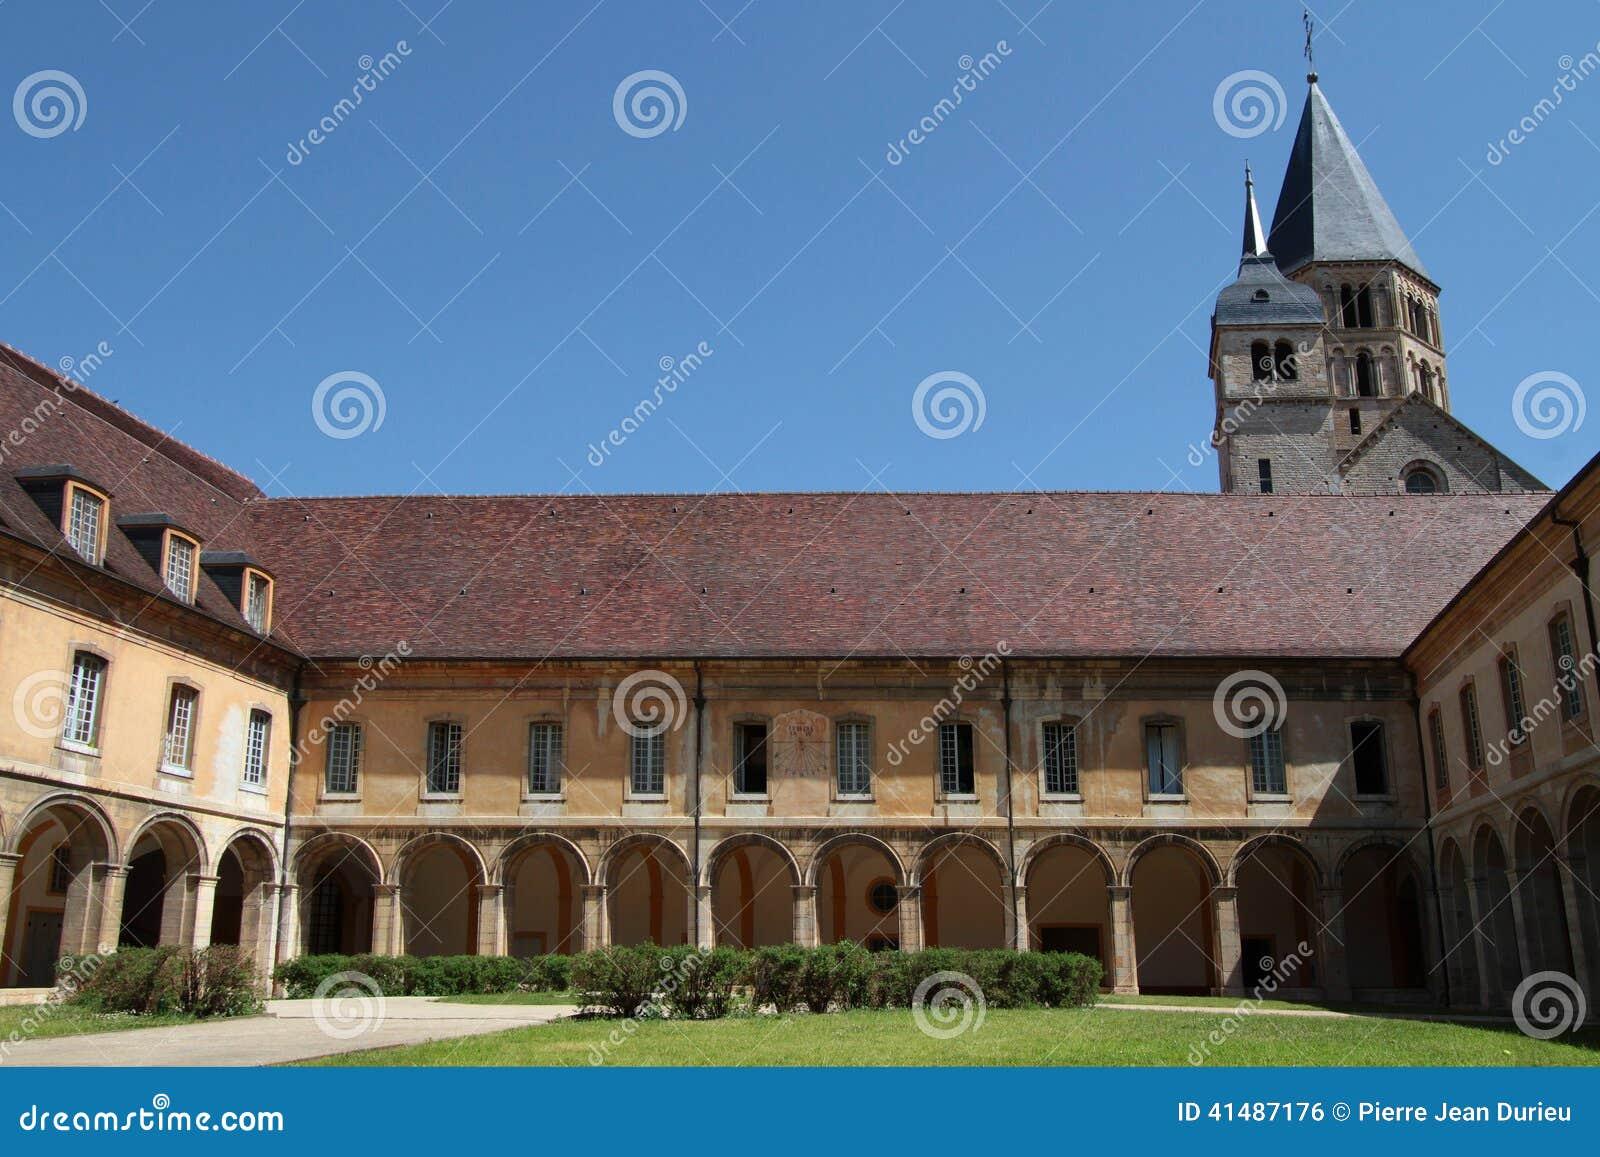 Mittelalter kloster 2 teil mit sandra brust 10